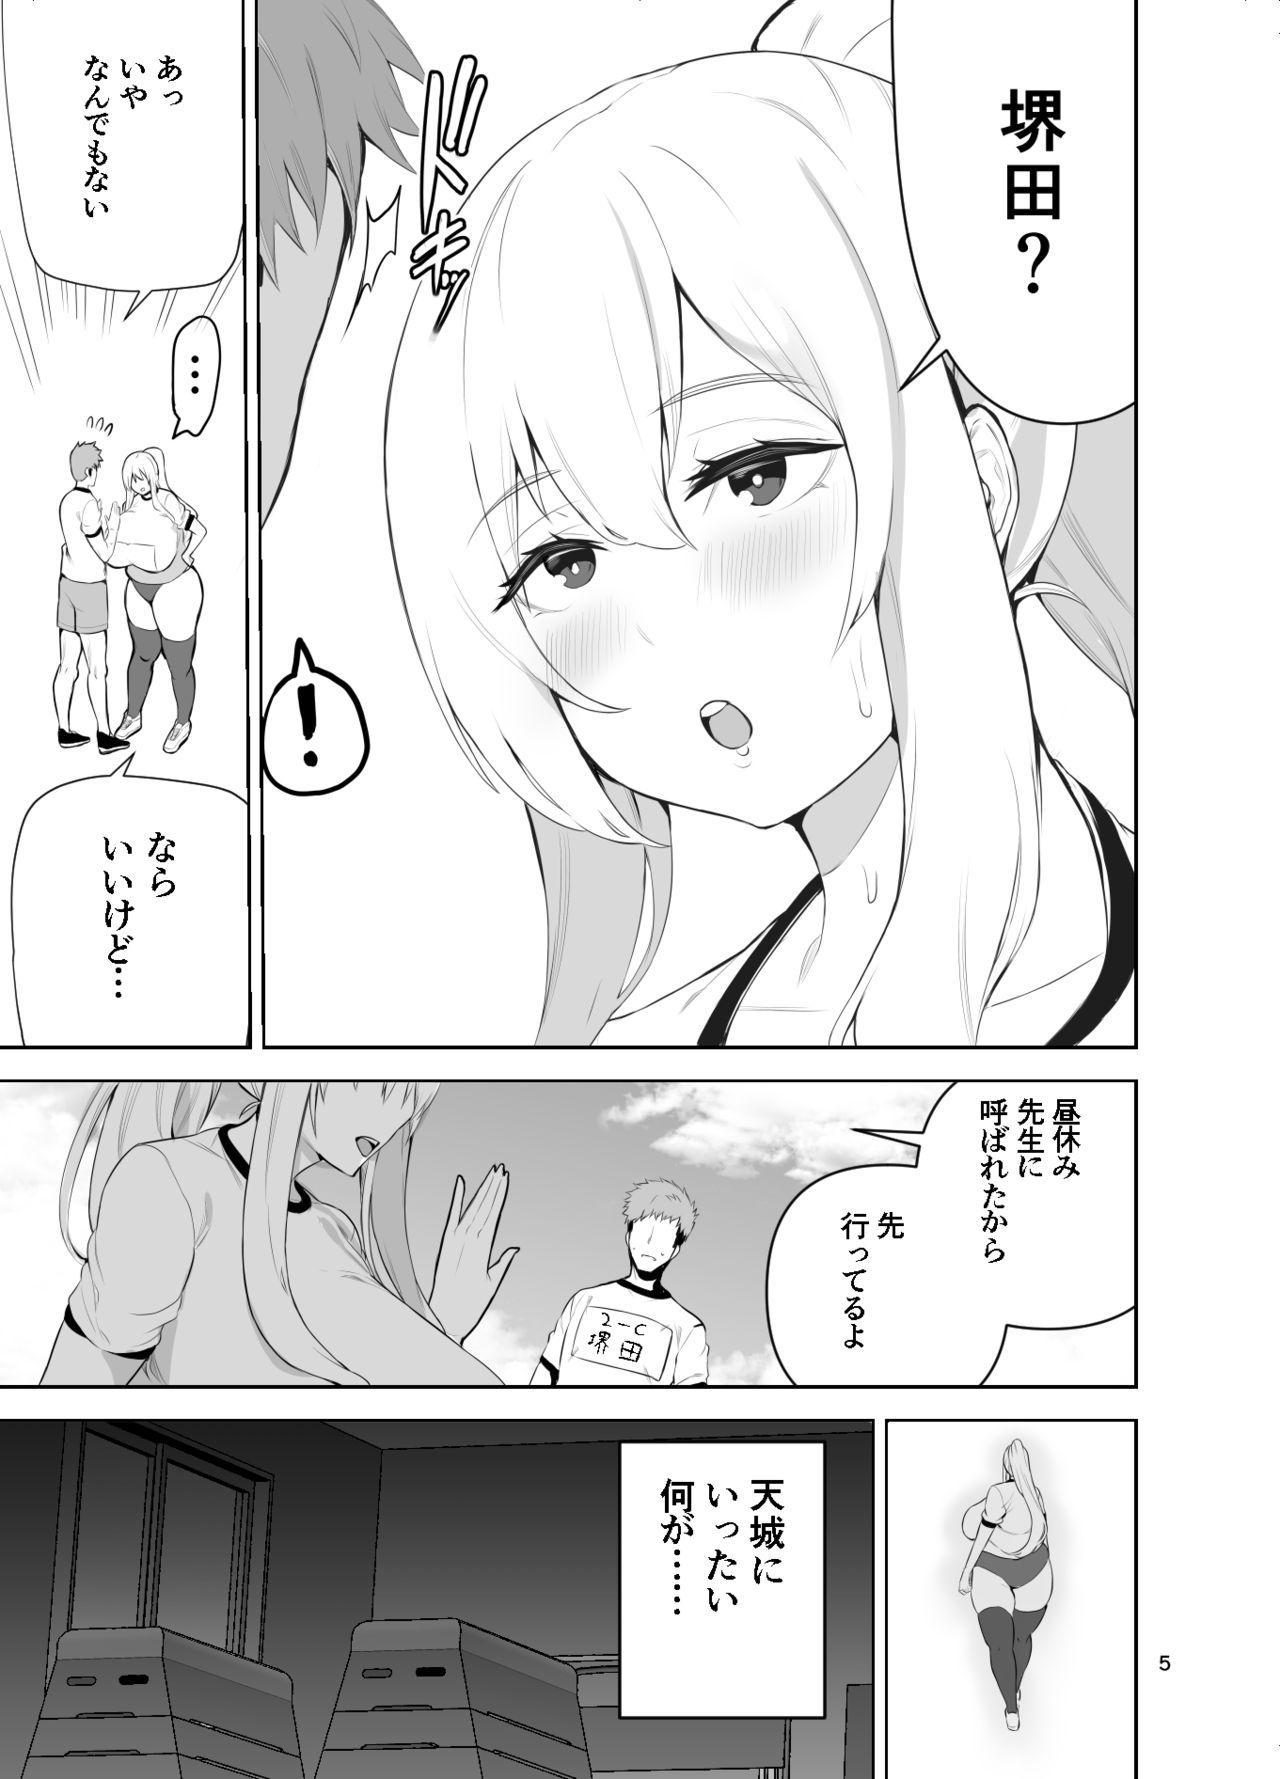 [Wakuseiburo (cup-chan)] TS Musume Kodama-chan to H! Sono 4 | TS Girl Kodama-chan and Ecchi! Part 4 [Digital] 5